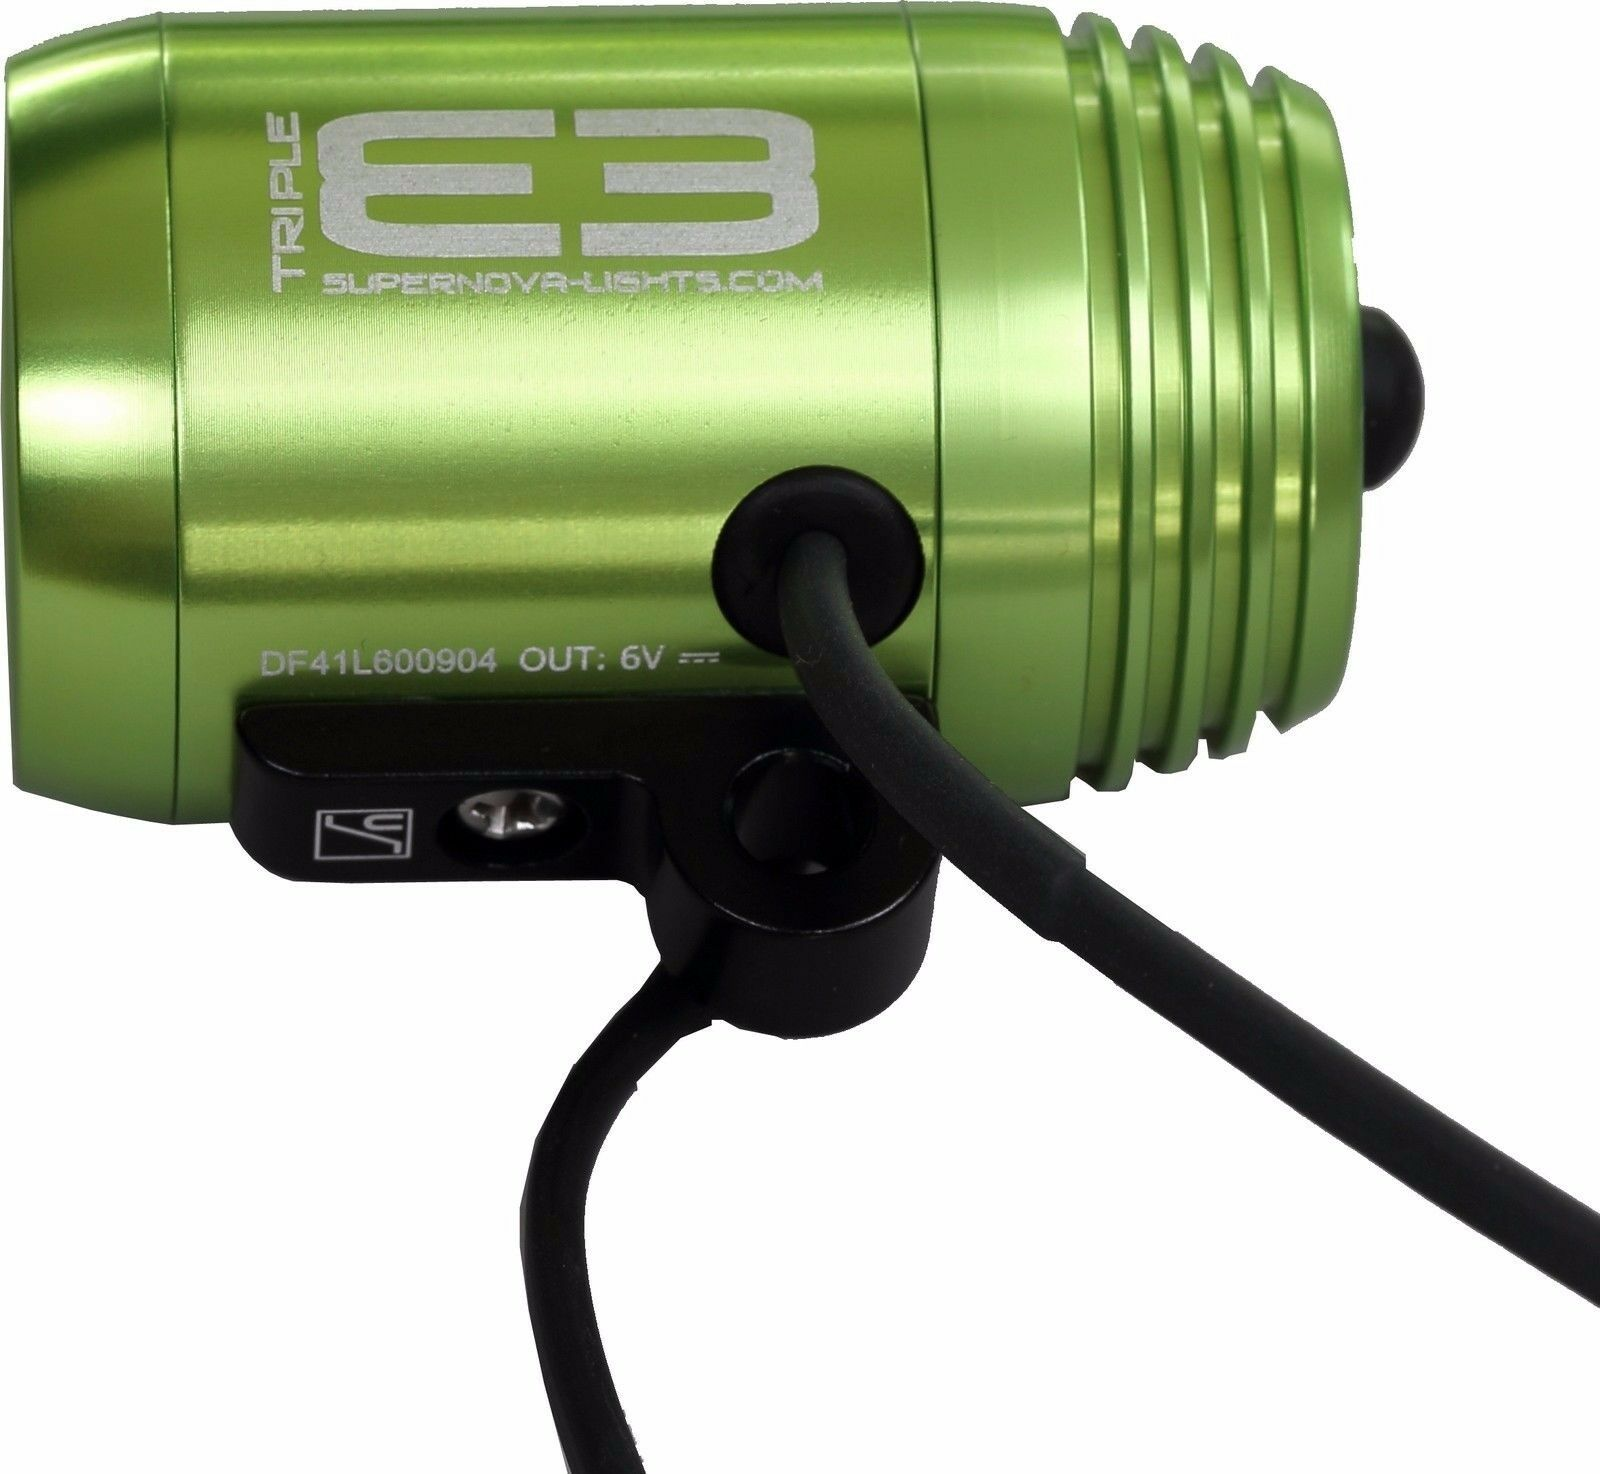 SUPERNOVA Frontscheinwerfer  E3 triple green 800 Lumen  outlet online store